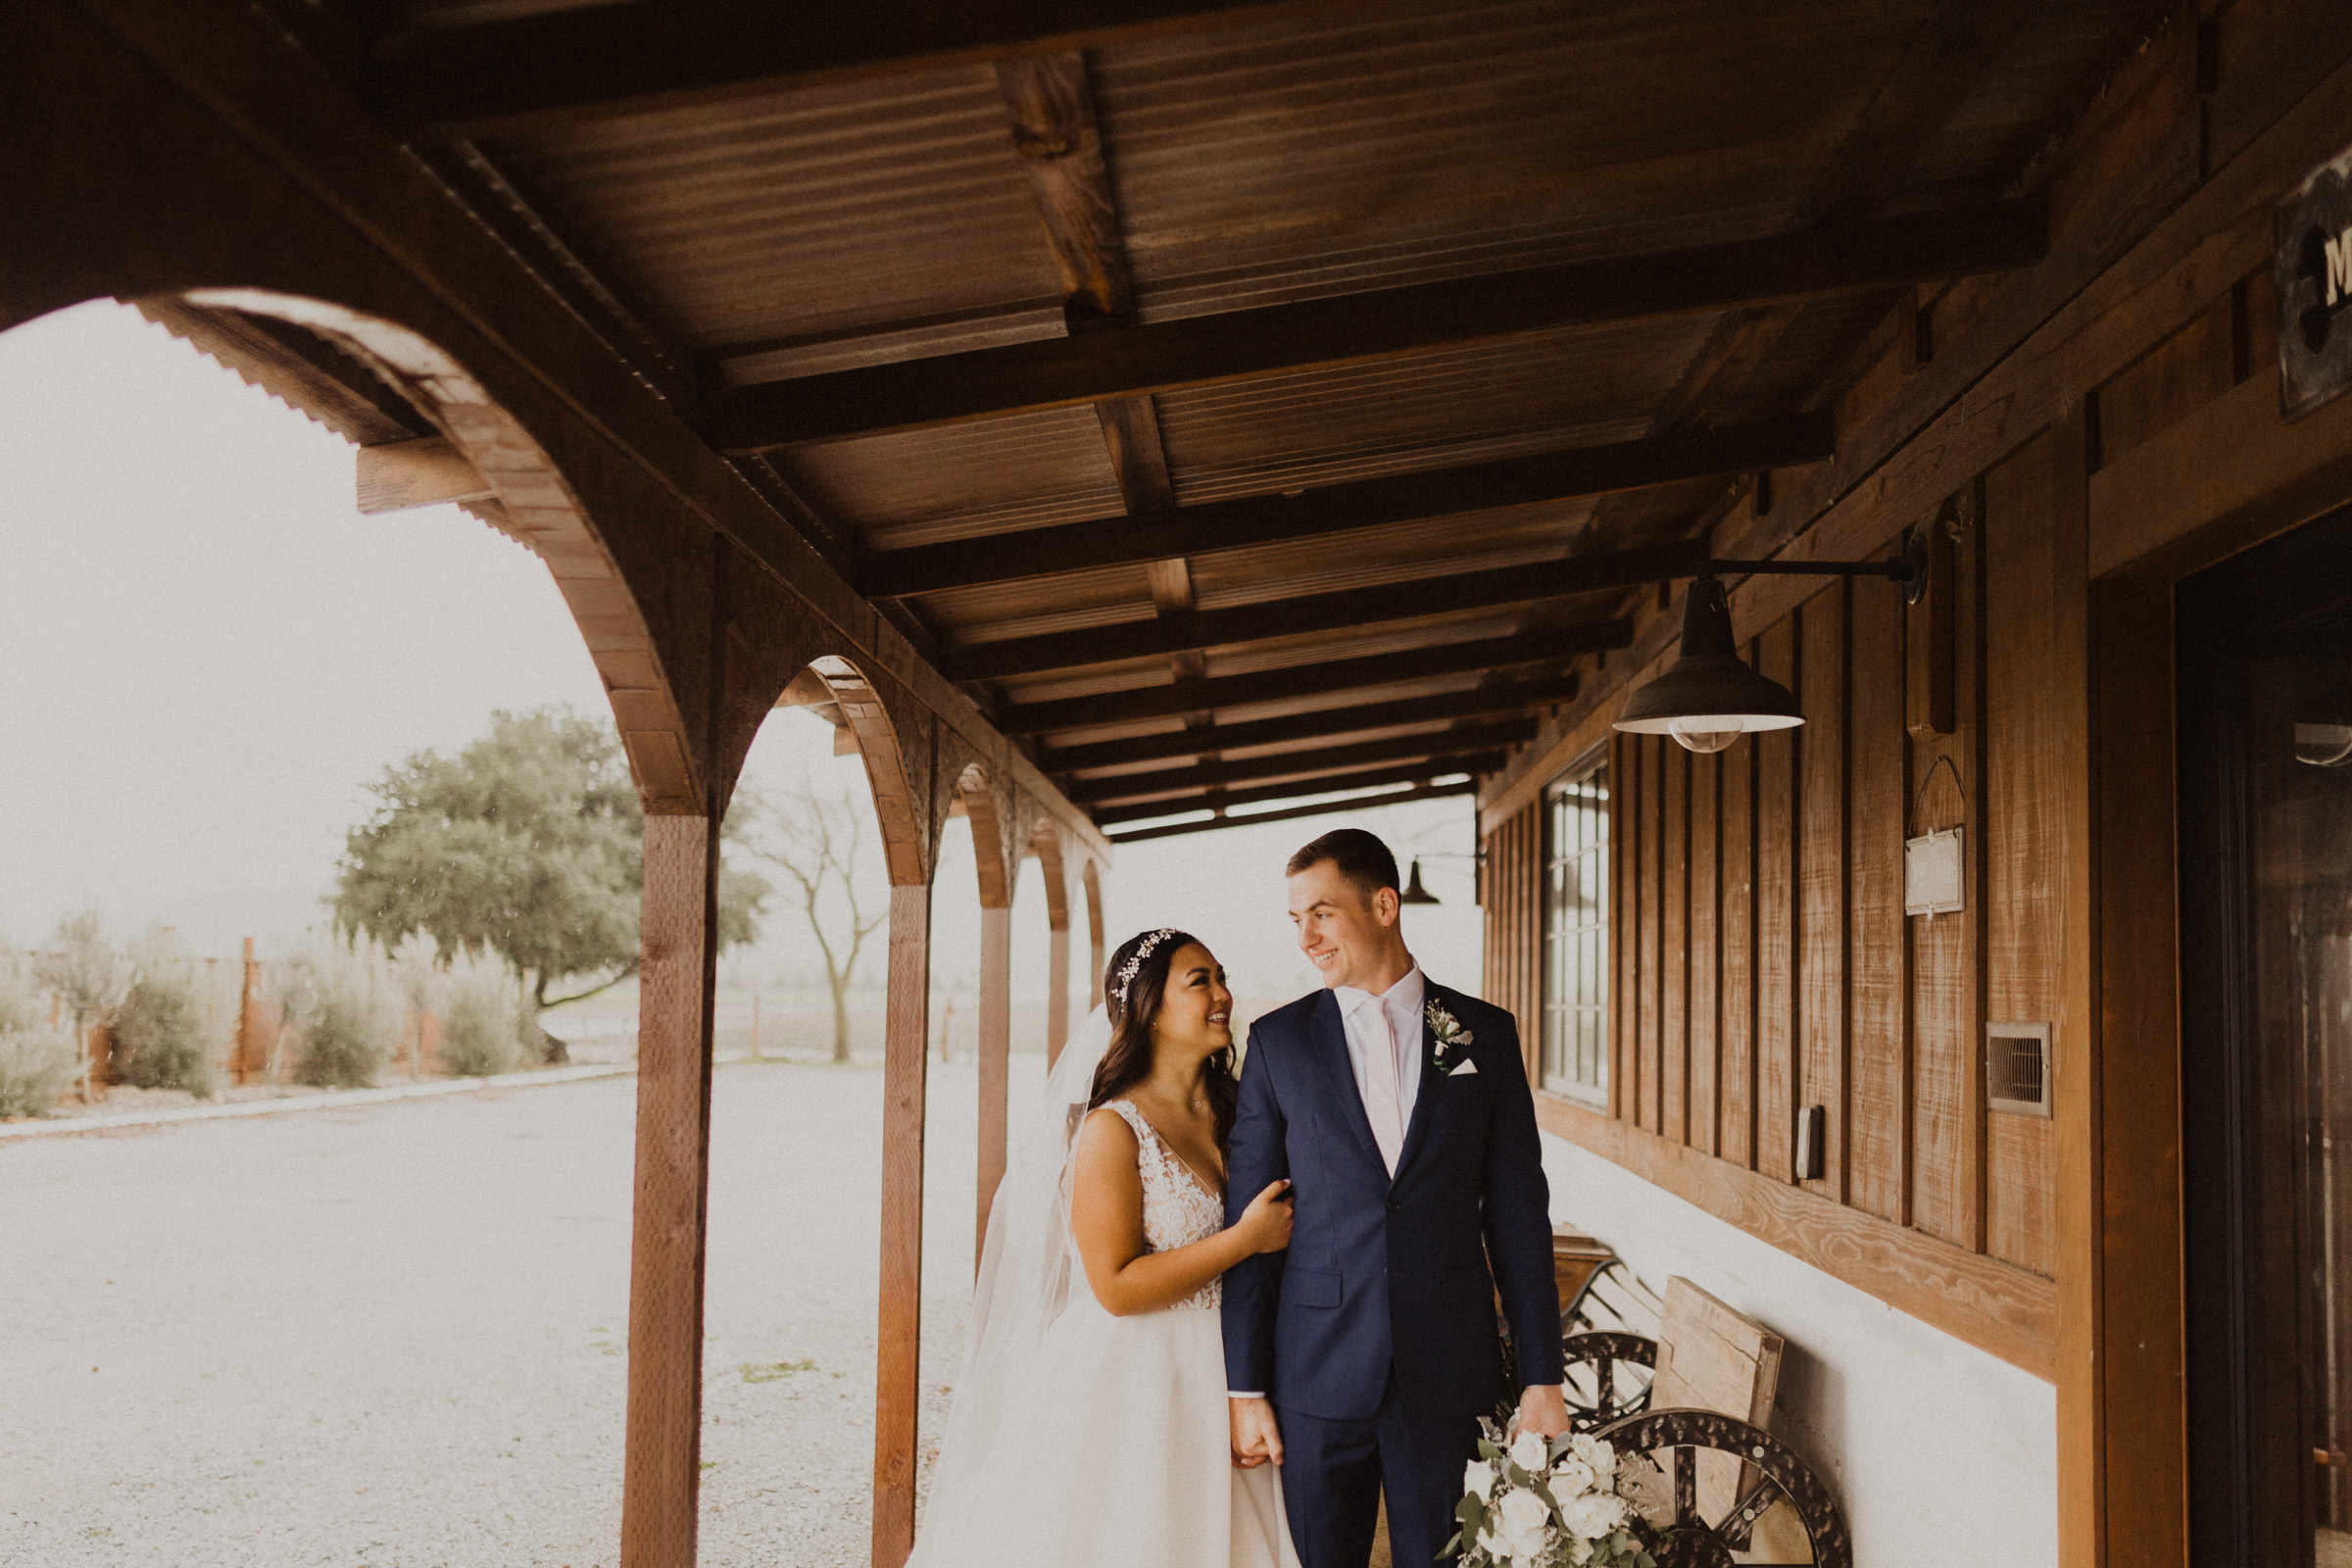 alyssa barletter photography destination wedding bay area san jose california winery photographer-24.jpg